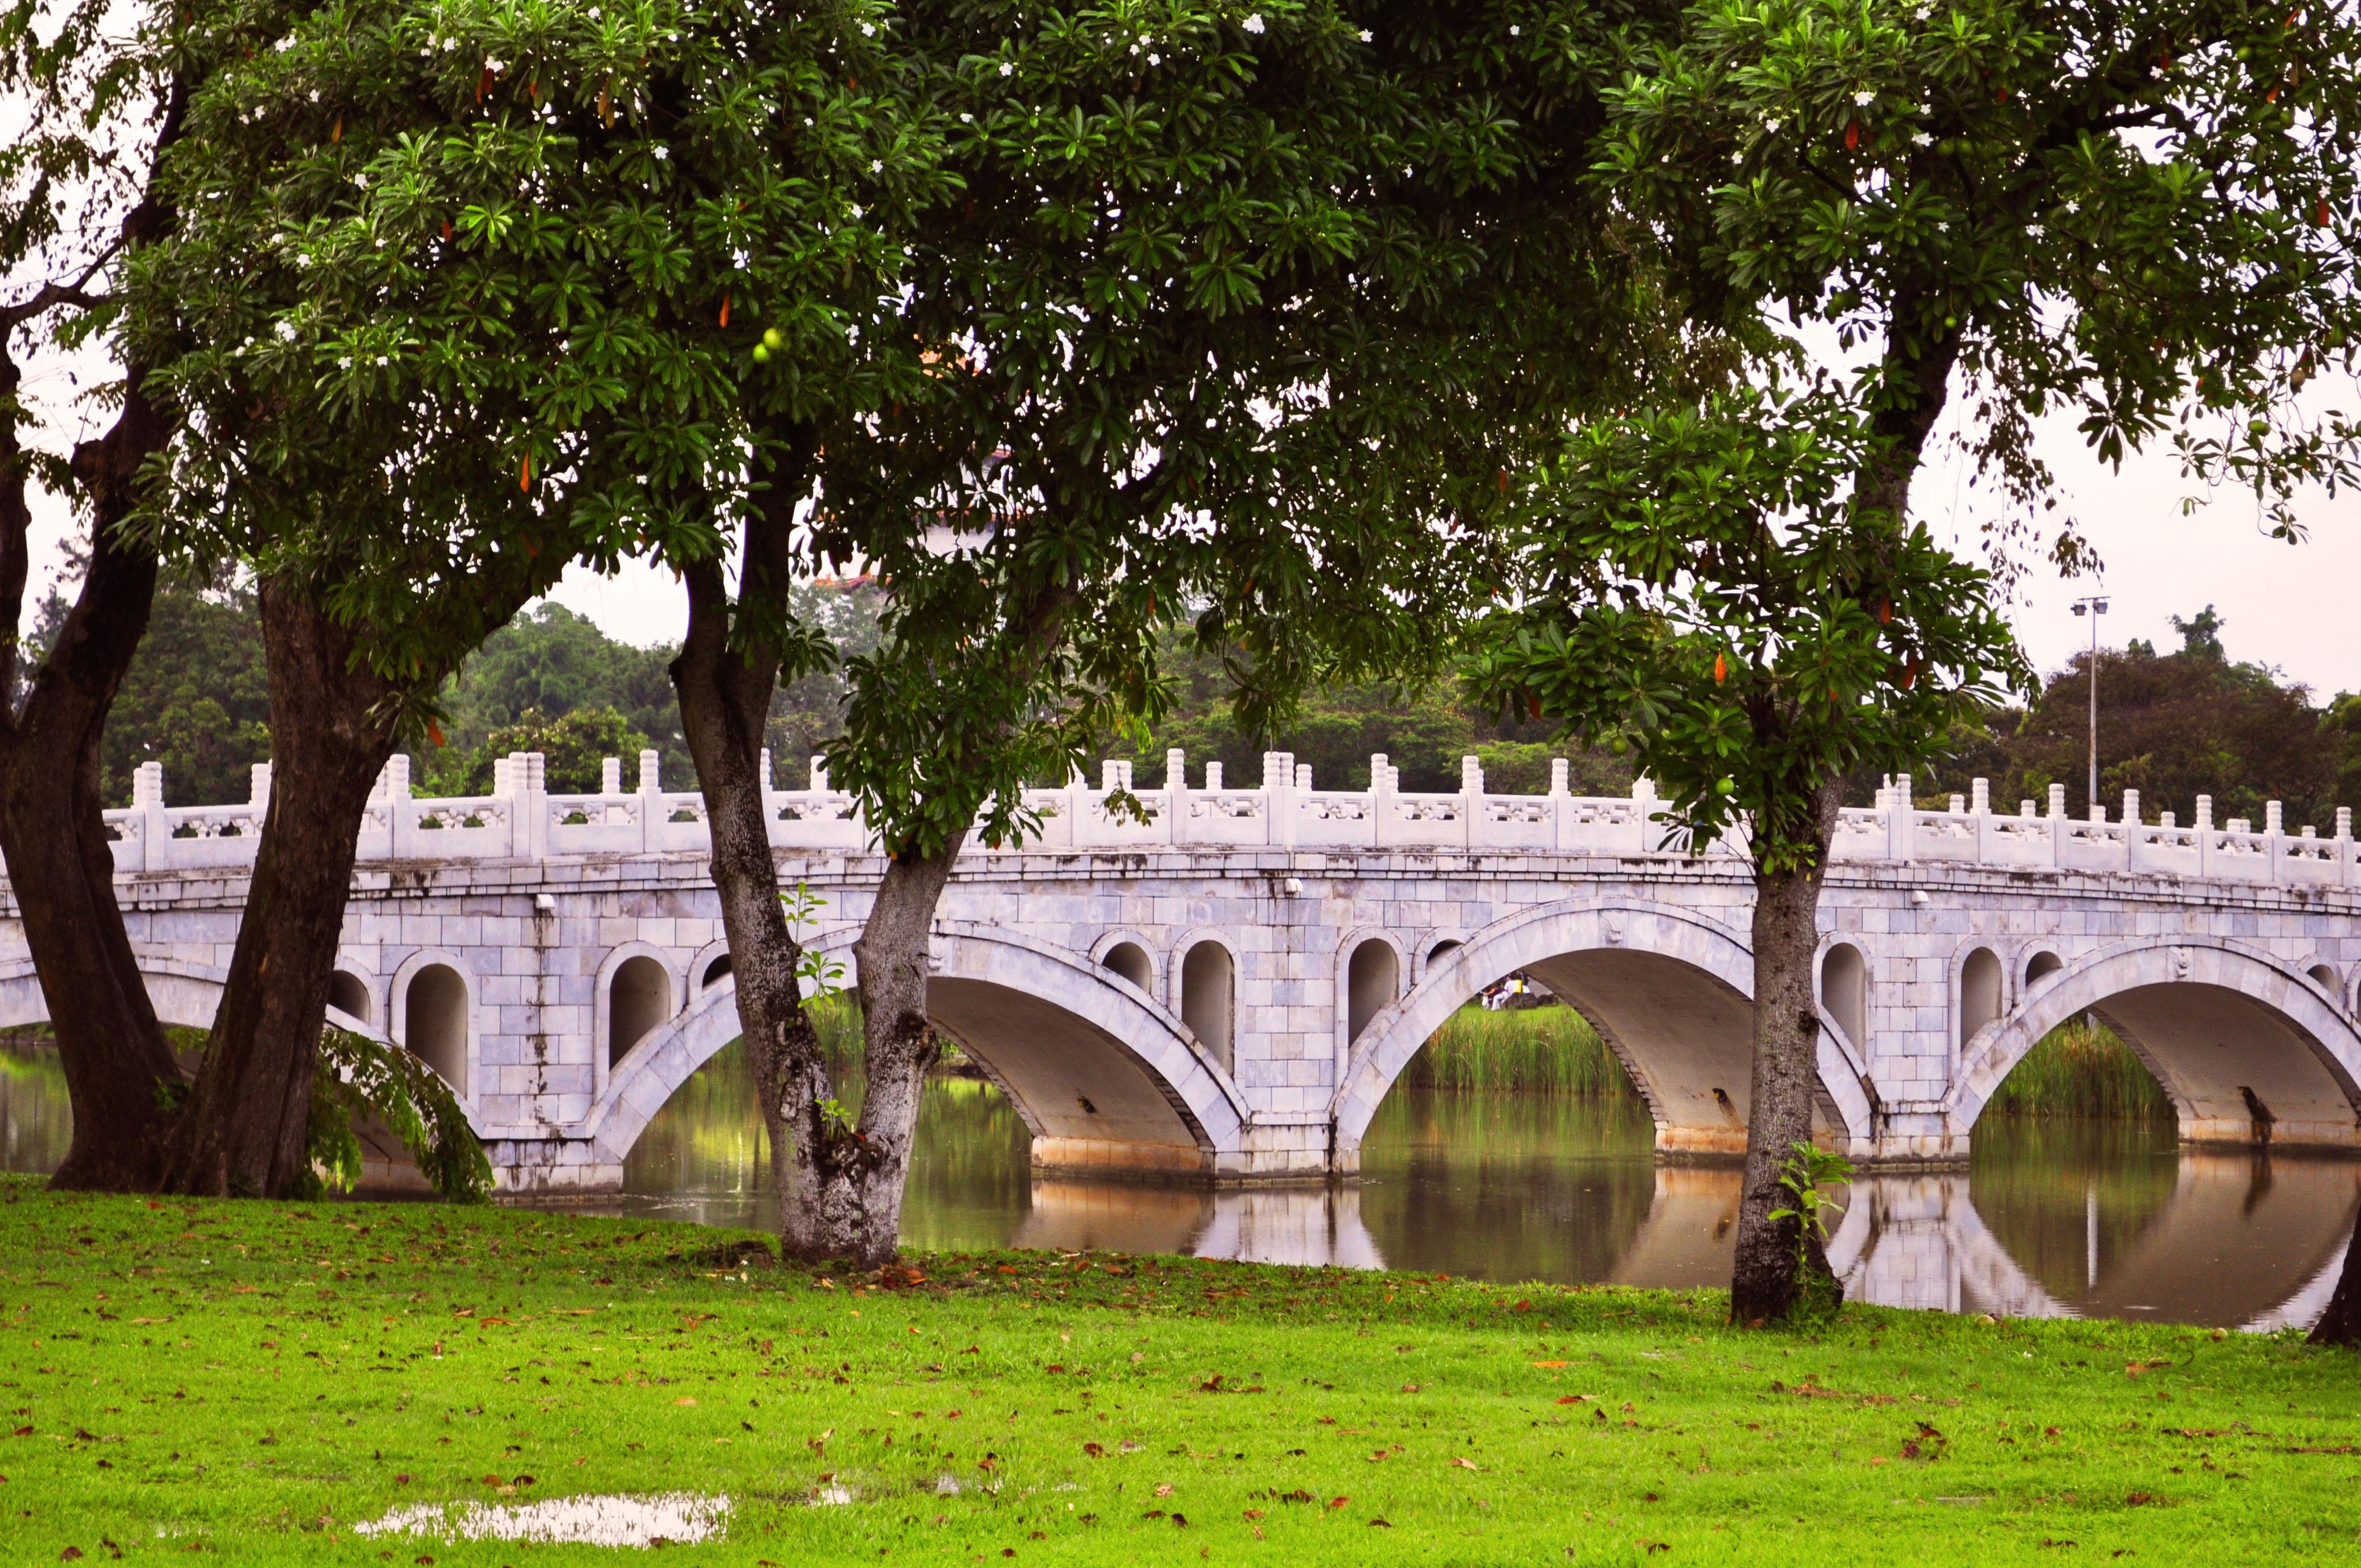 Chinese Garden Bridges Style - pixelmari.com